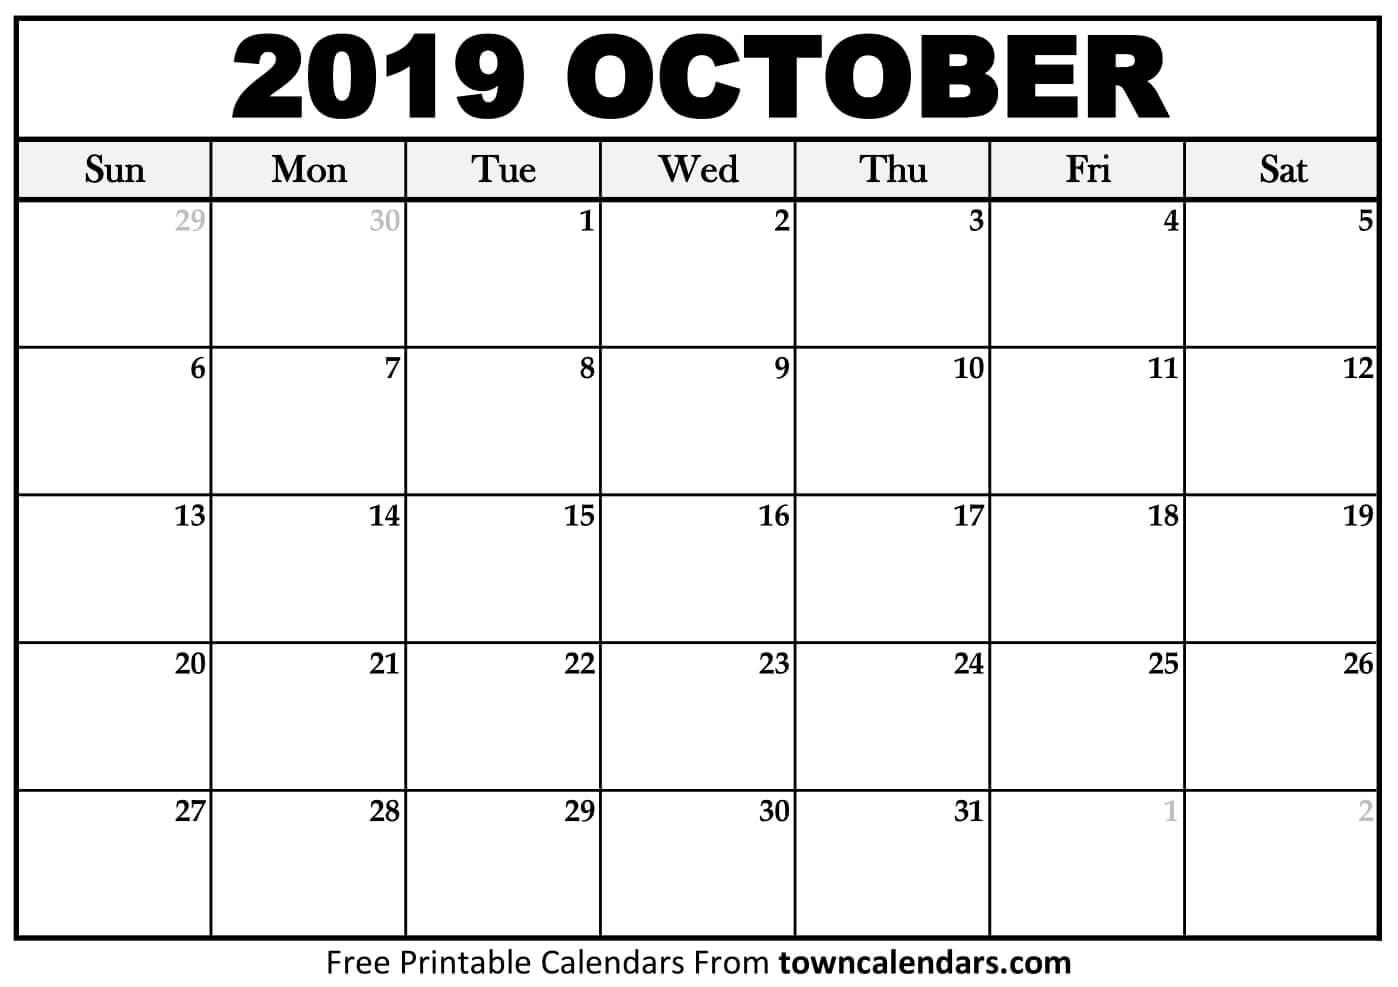 Printable October 2019 Calendar - Towncalendars for Catholic Calander For October 2019